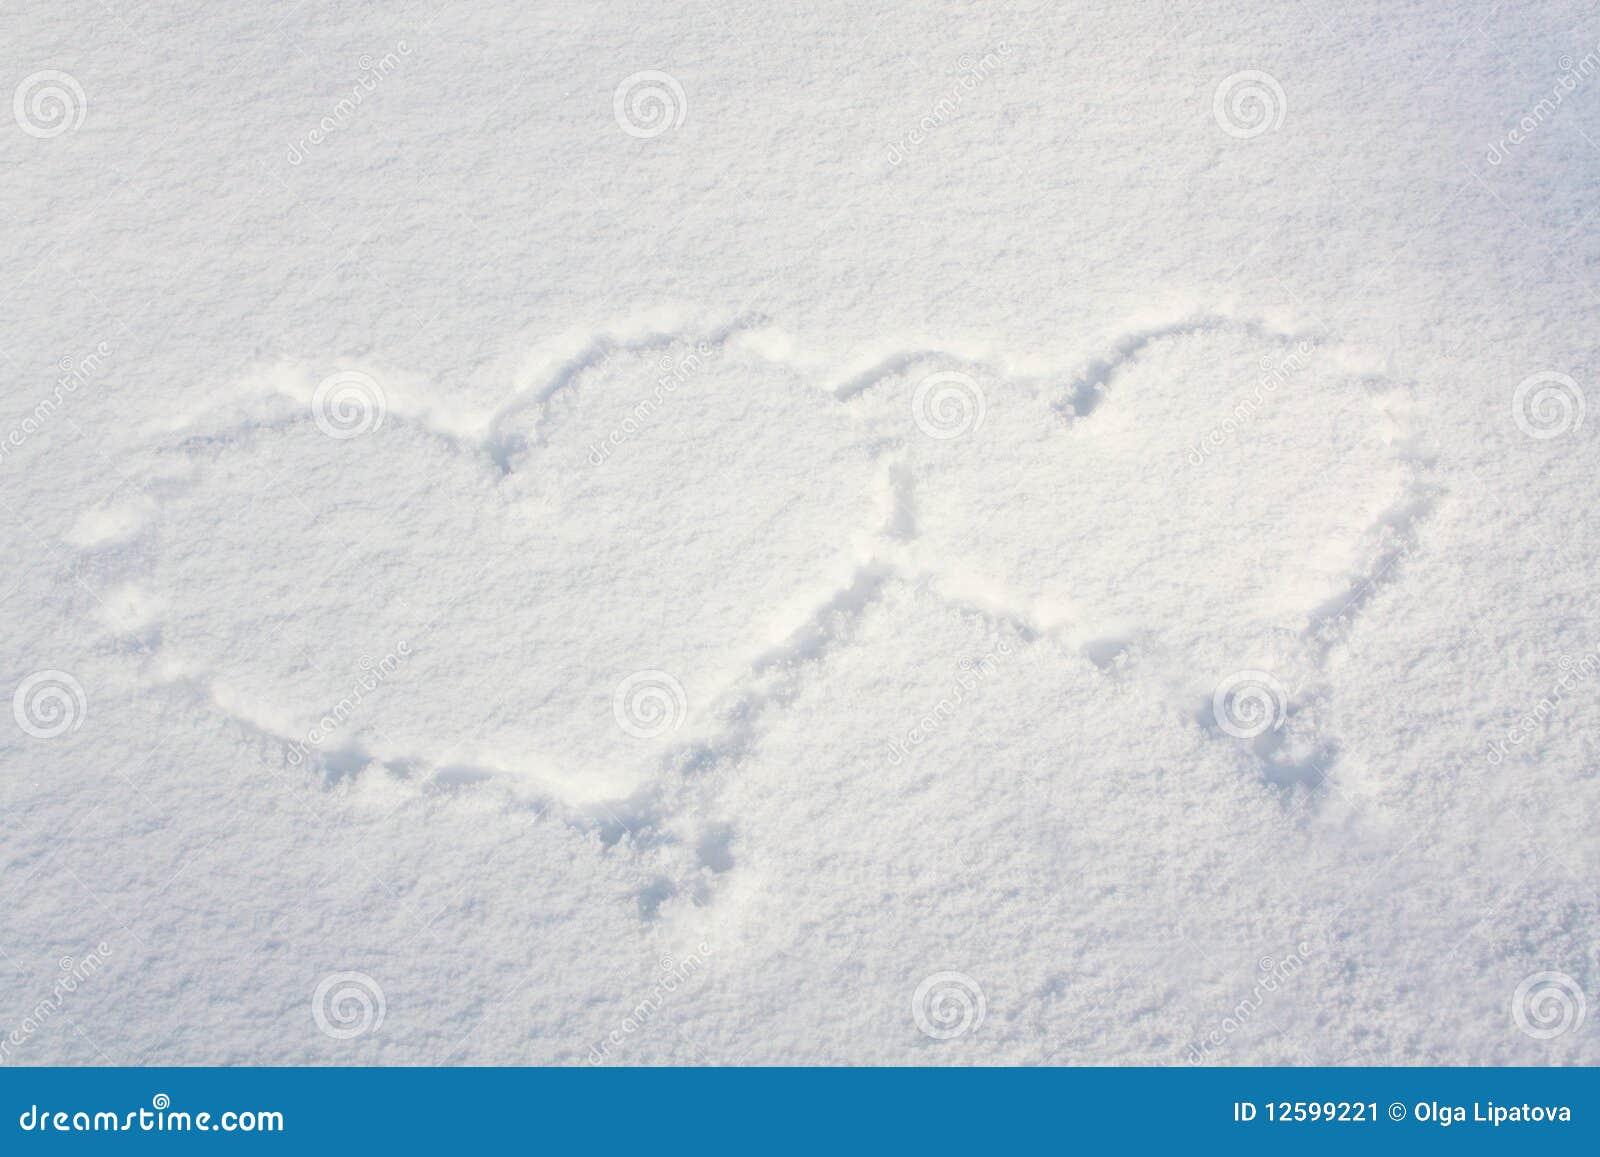 Corações da neve